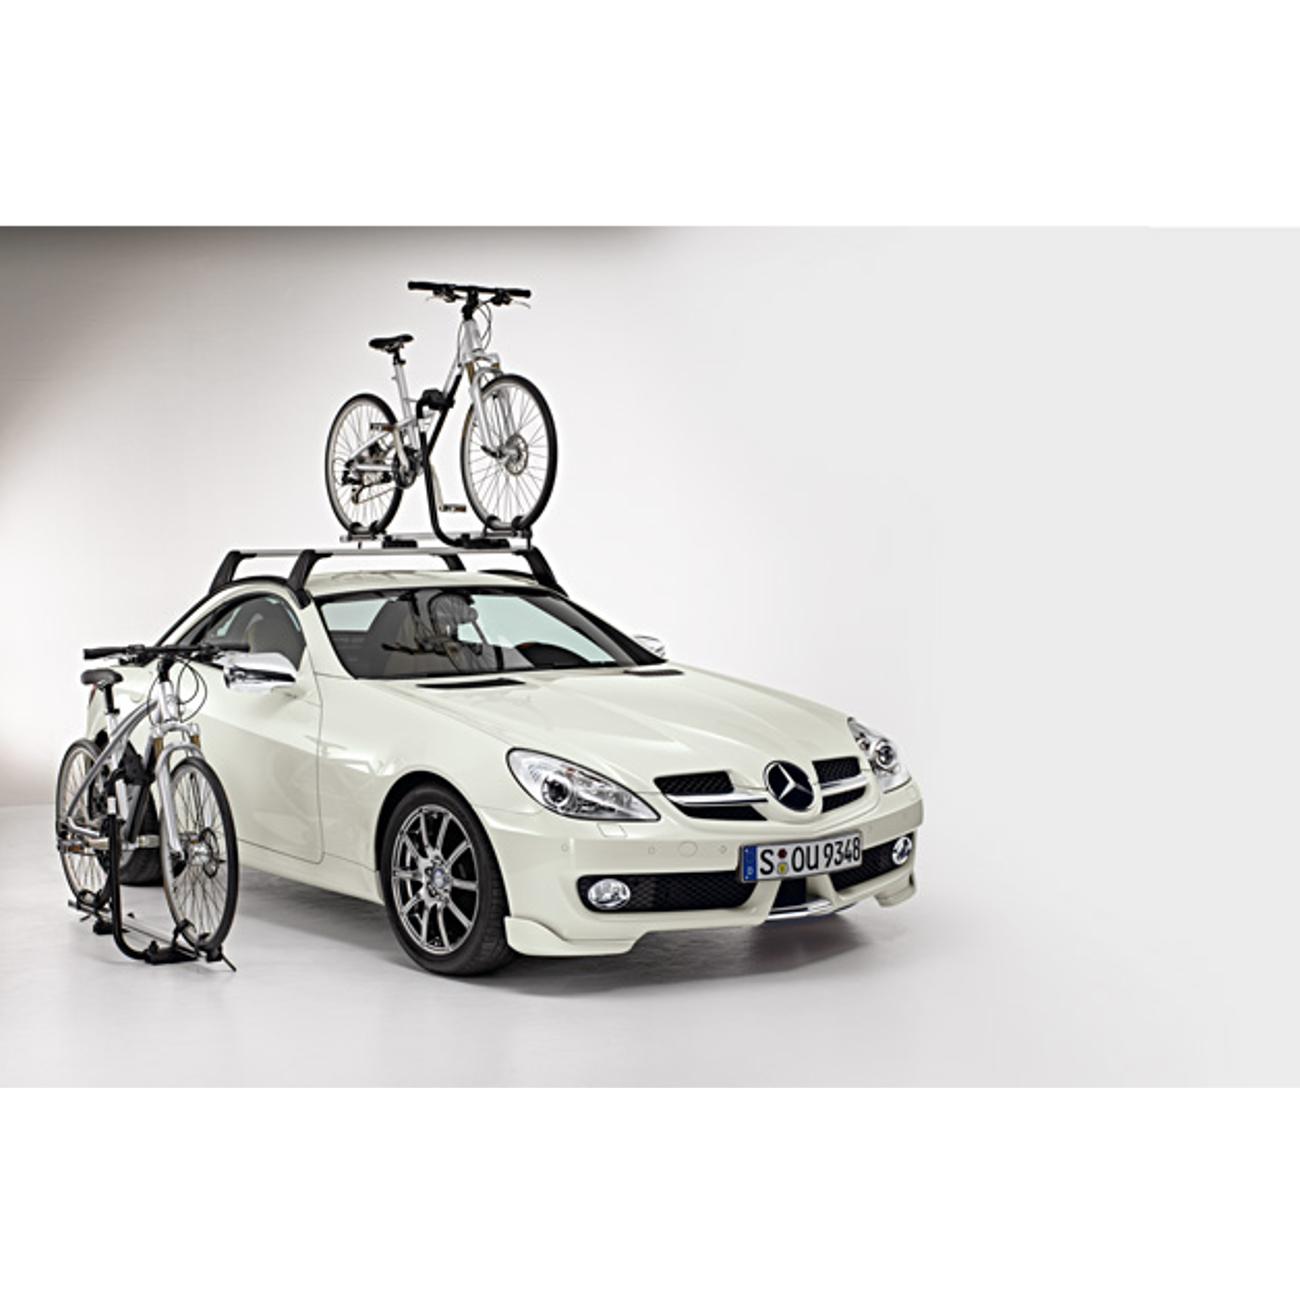 mercedes benz fahrradtr ger new alustyle a0008900293. Black Bedroom Furniture Sets. Home Design Ideas